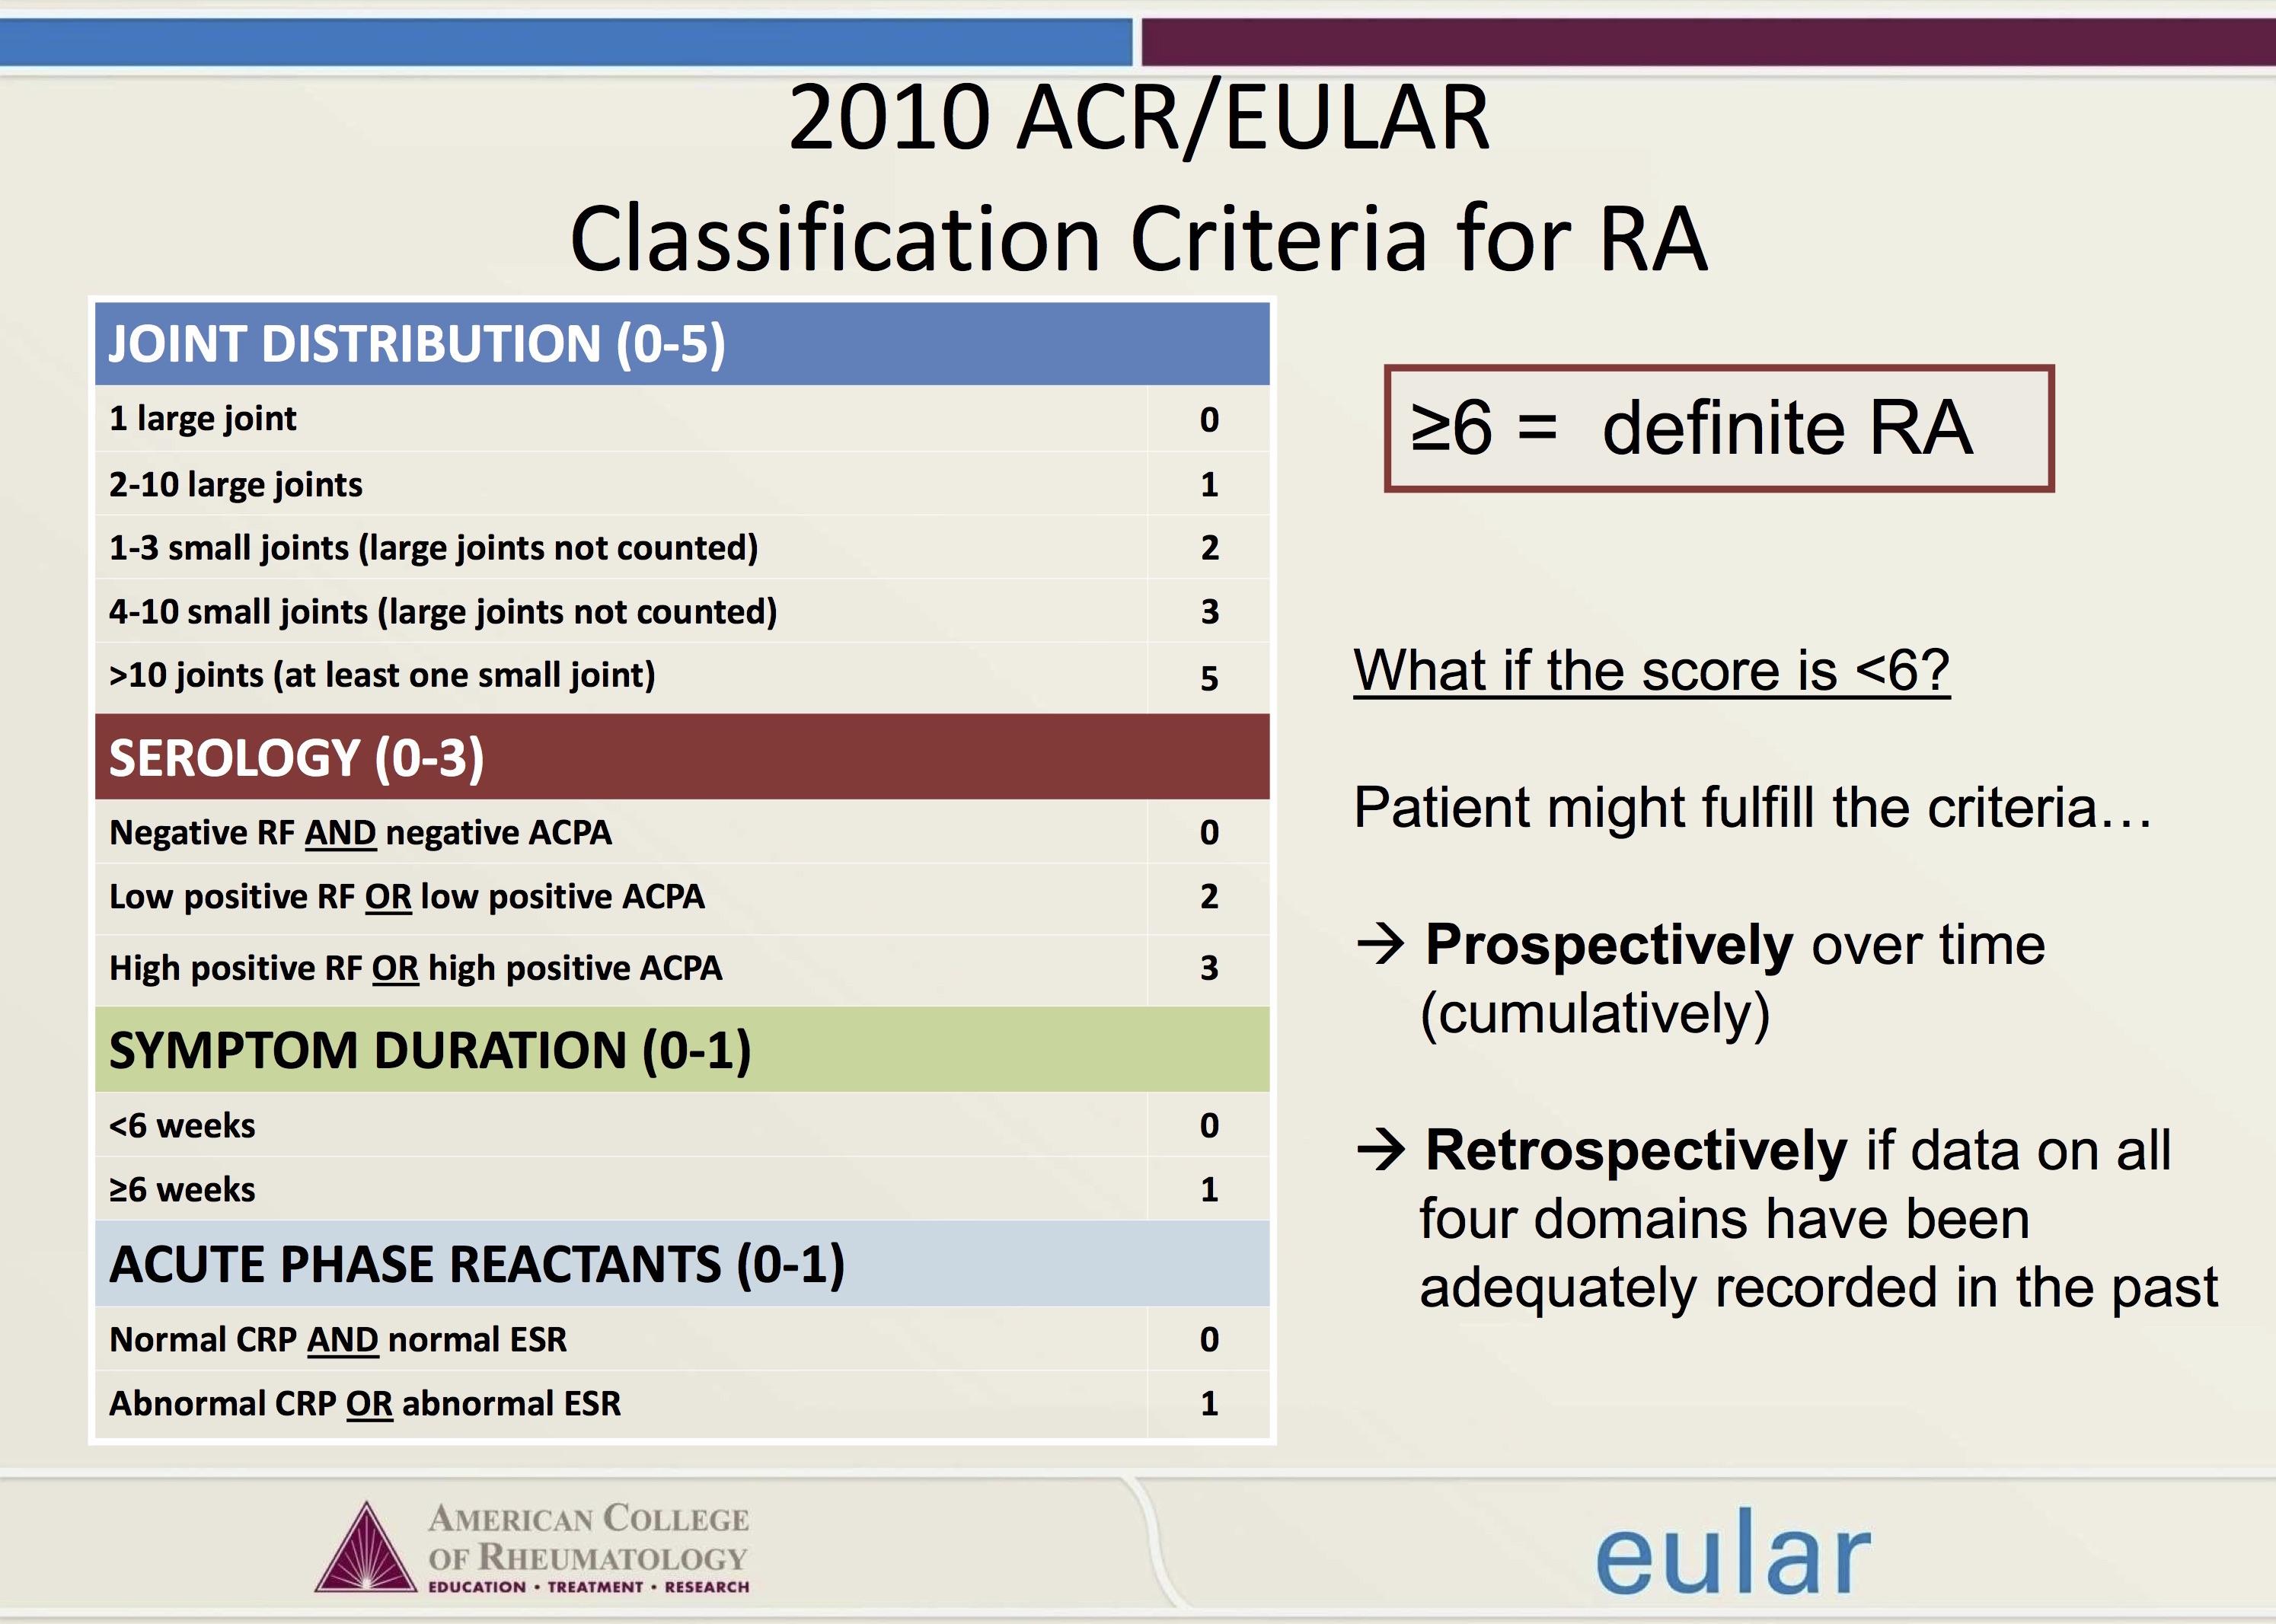 2010_ACREULAR_Classification_criteria_for_RA.jpg